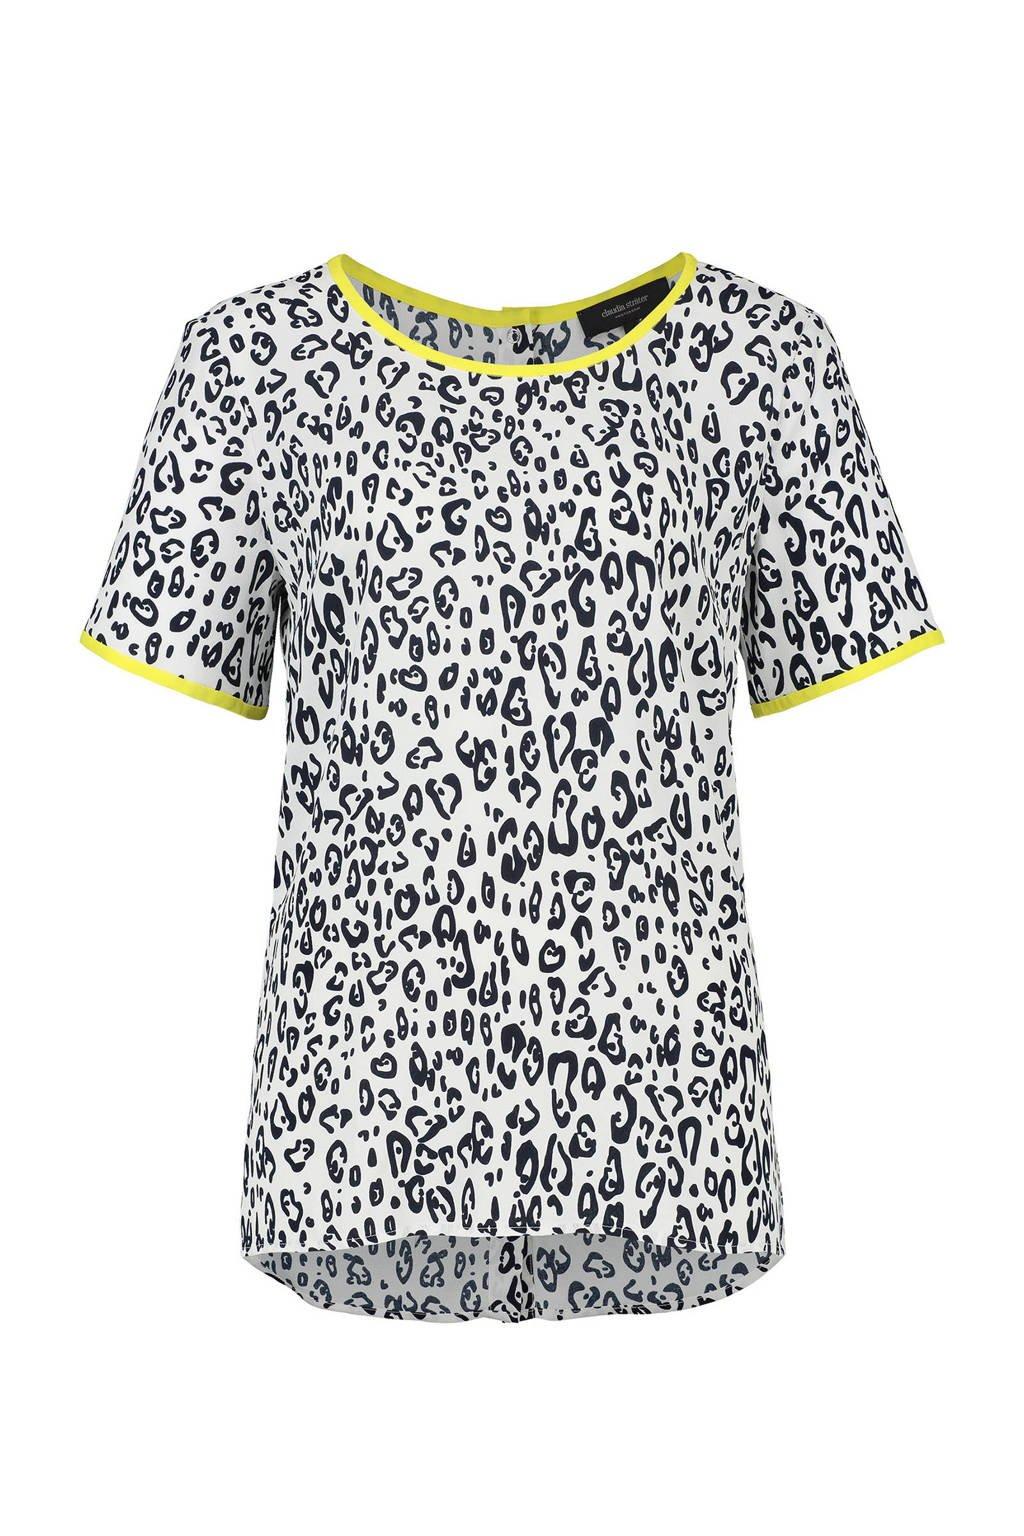 Claudia Sträter T-shirt met panterprint wit, Wit/zwart/geel